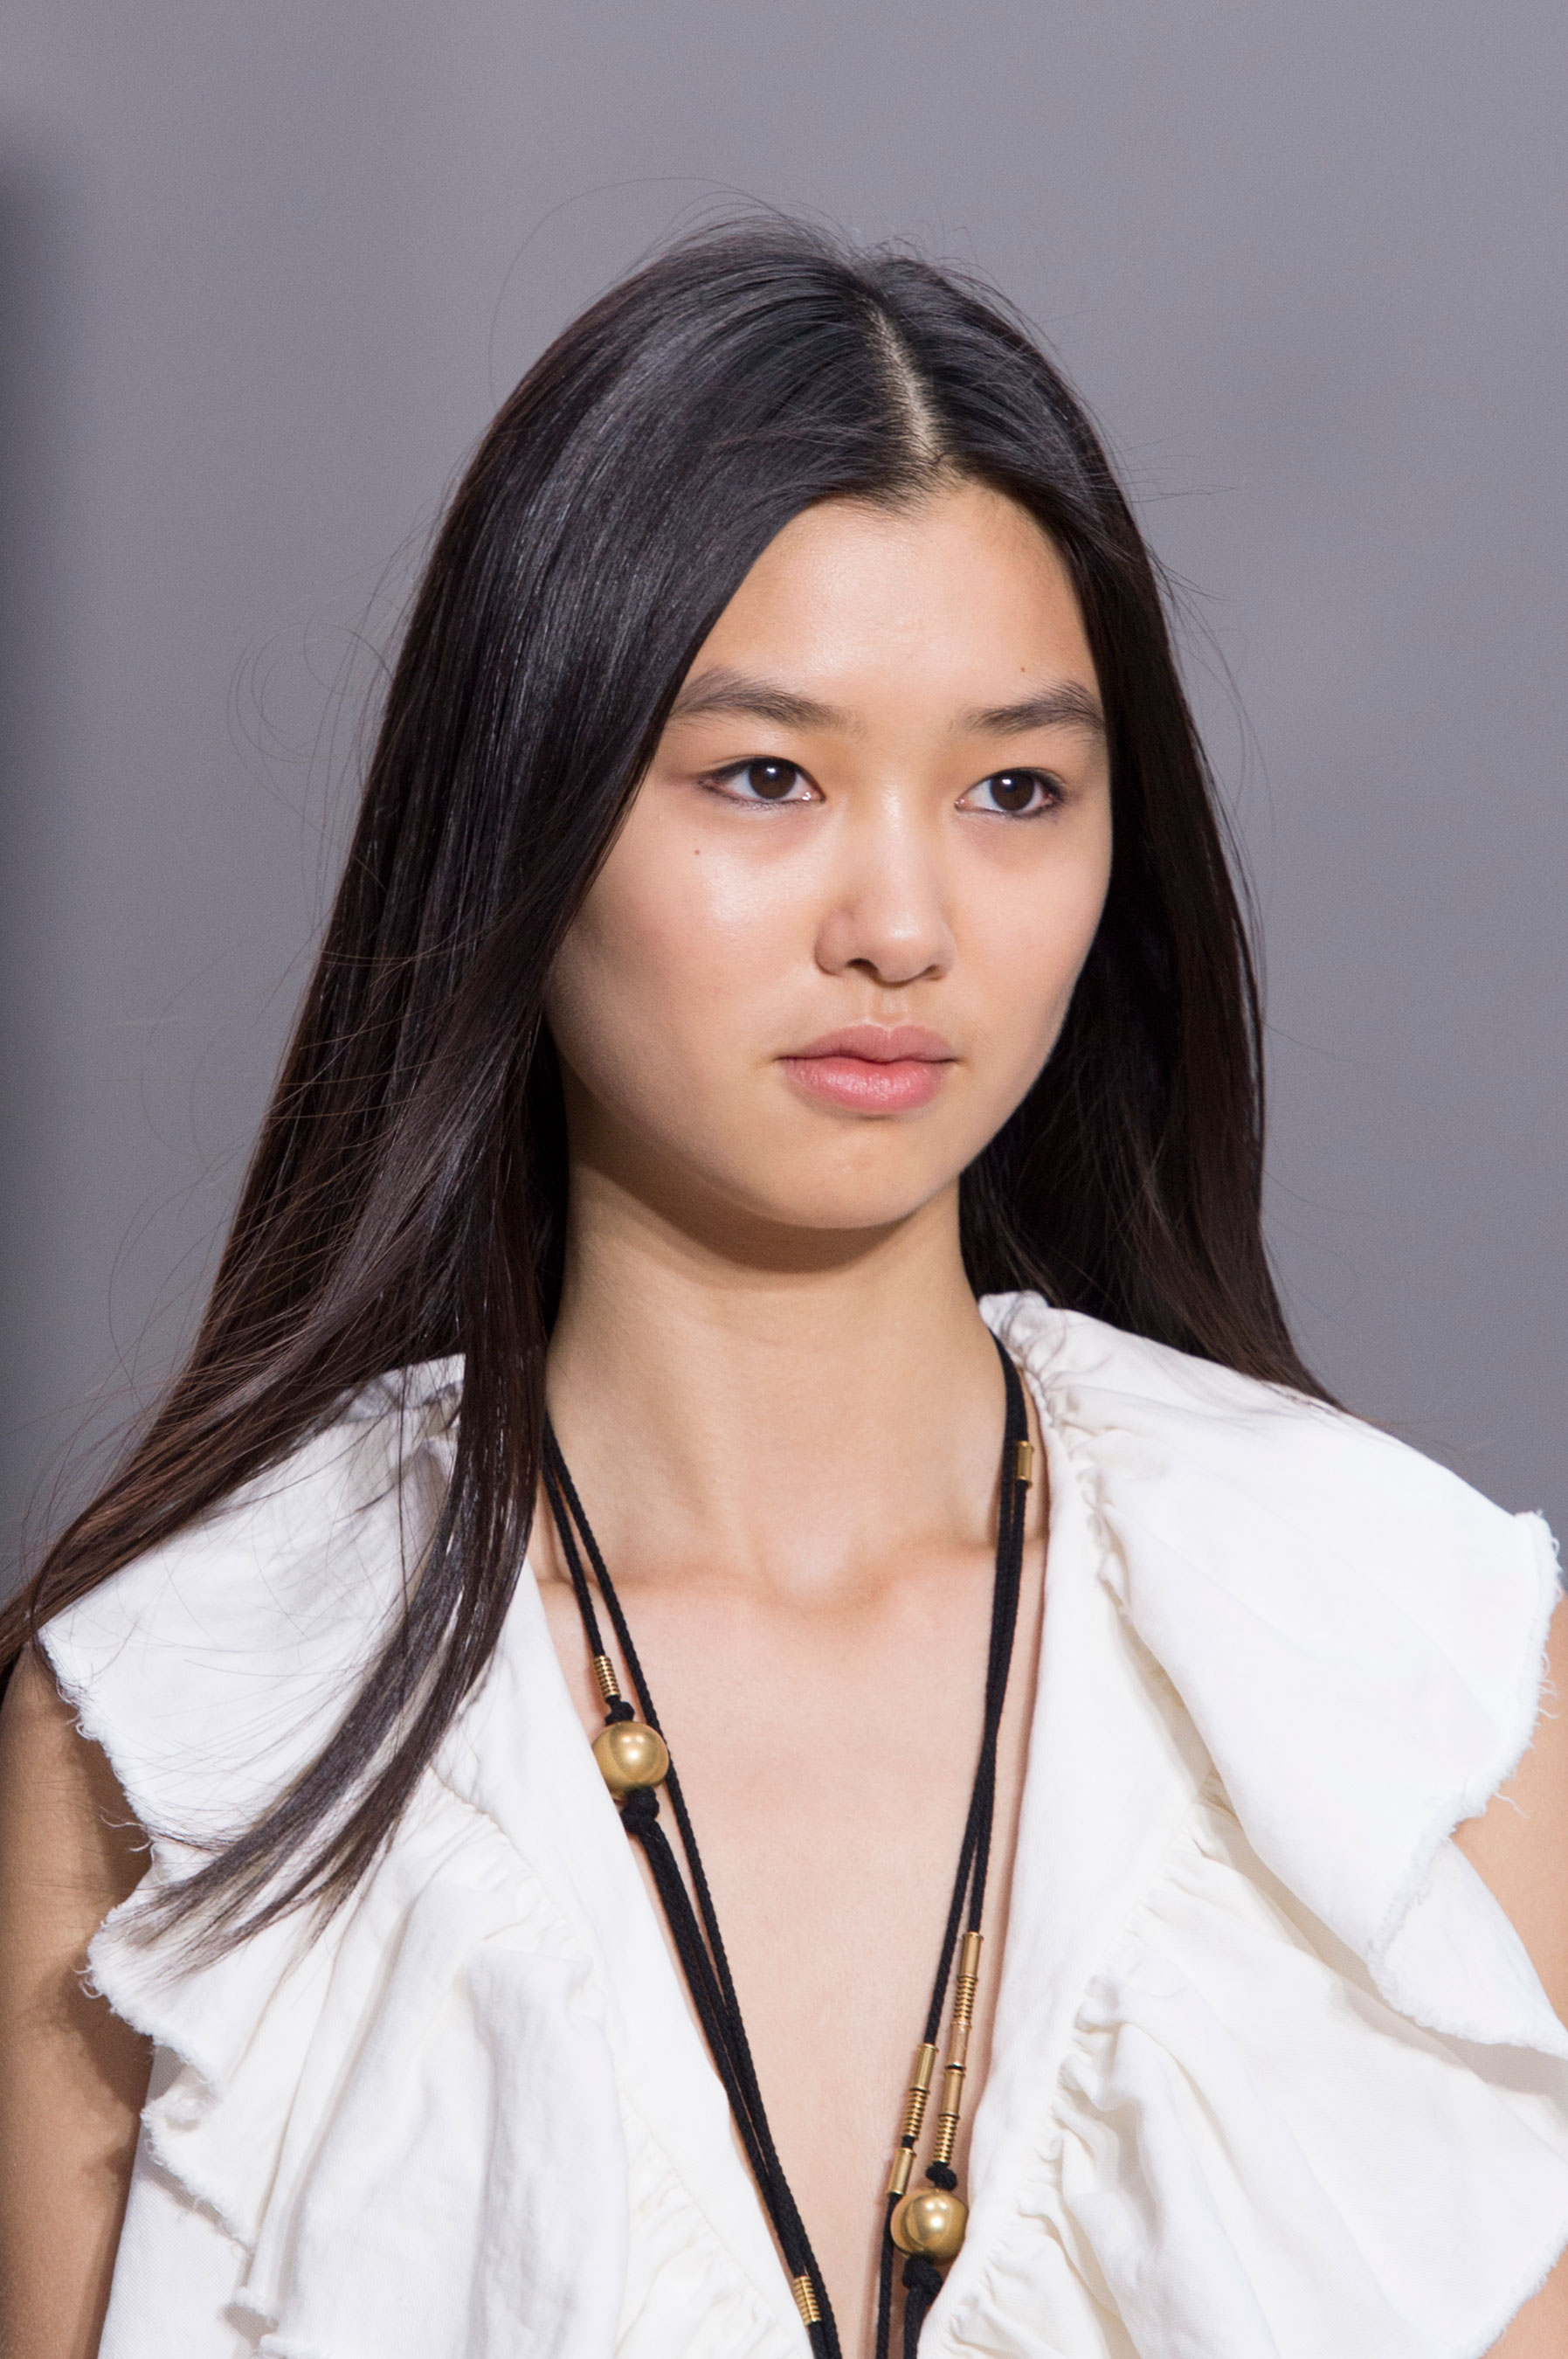 Chloe-spring-2016-runway-beauty-fashion-show-the-impression-20